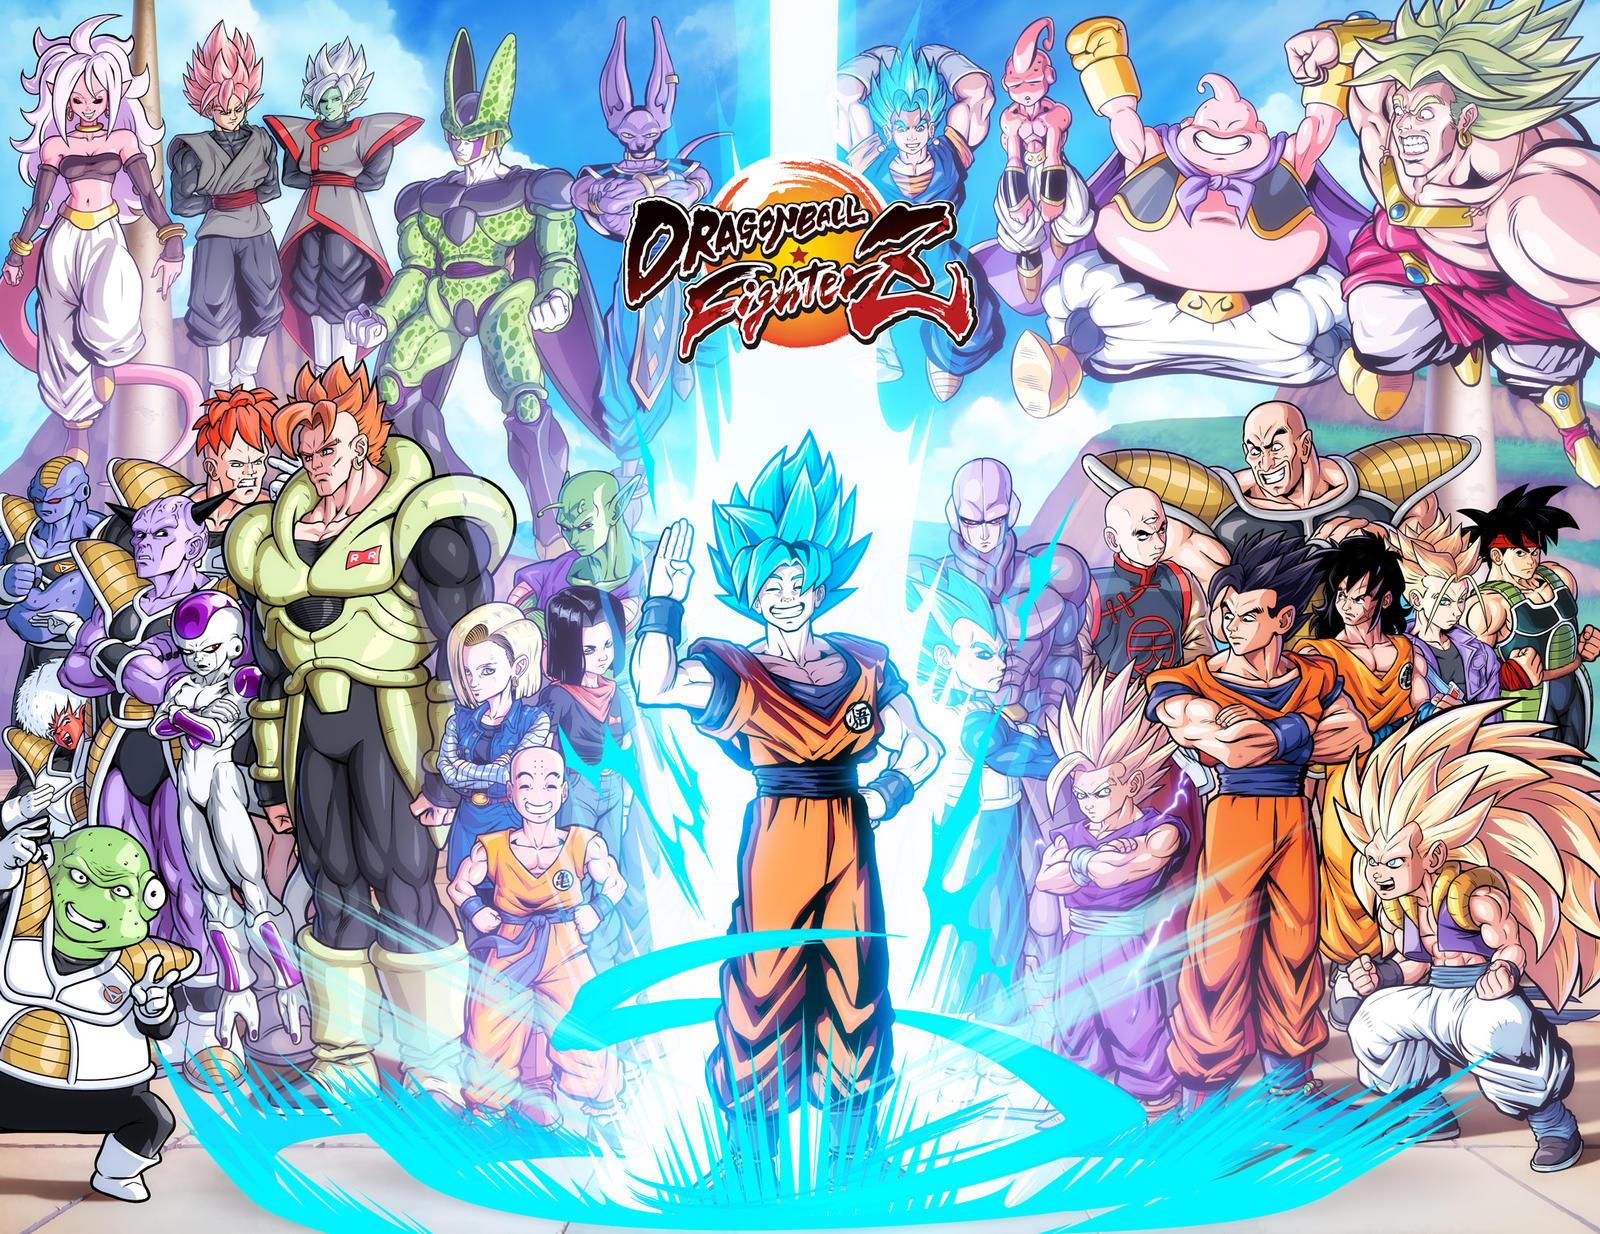 Dragonball fighter Z by danimation2001